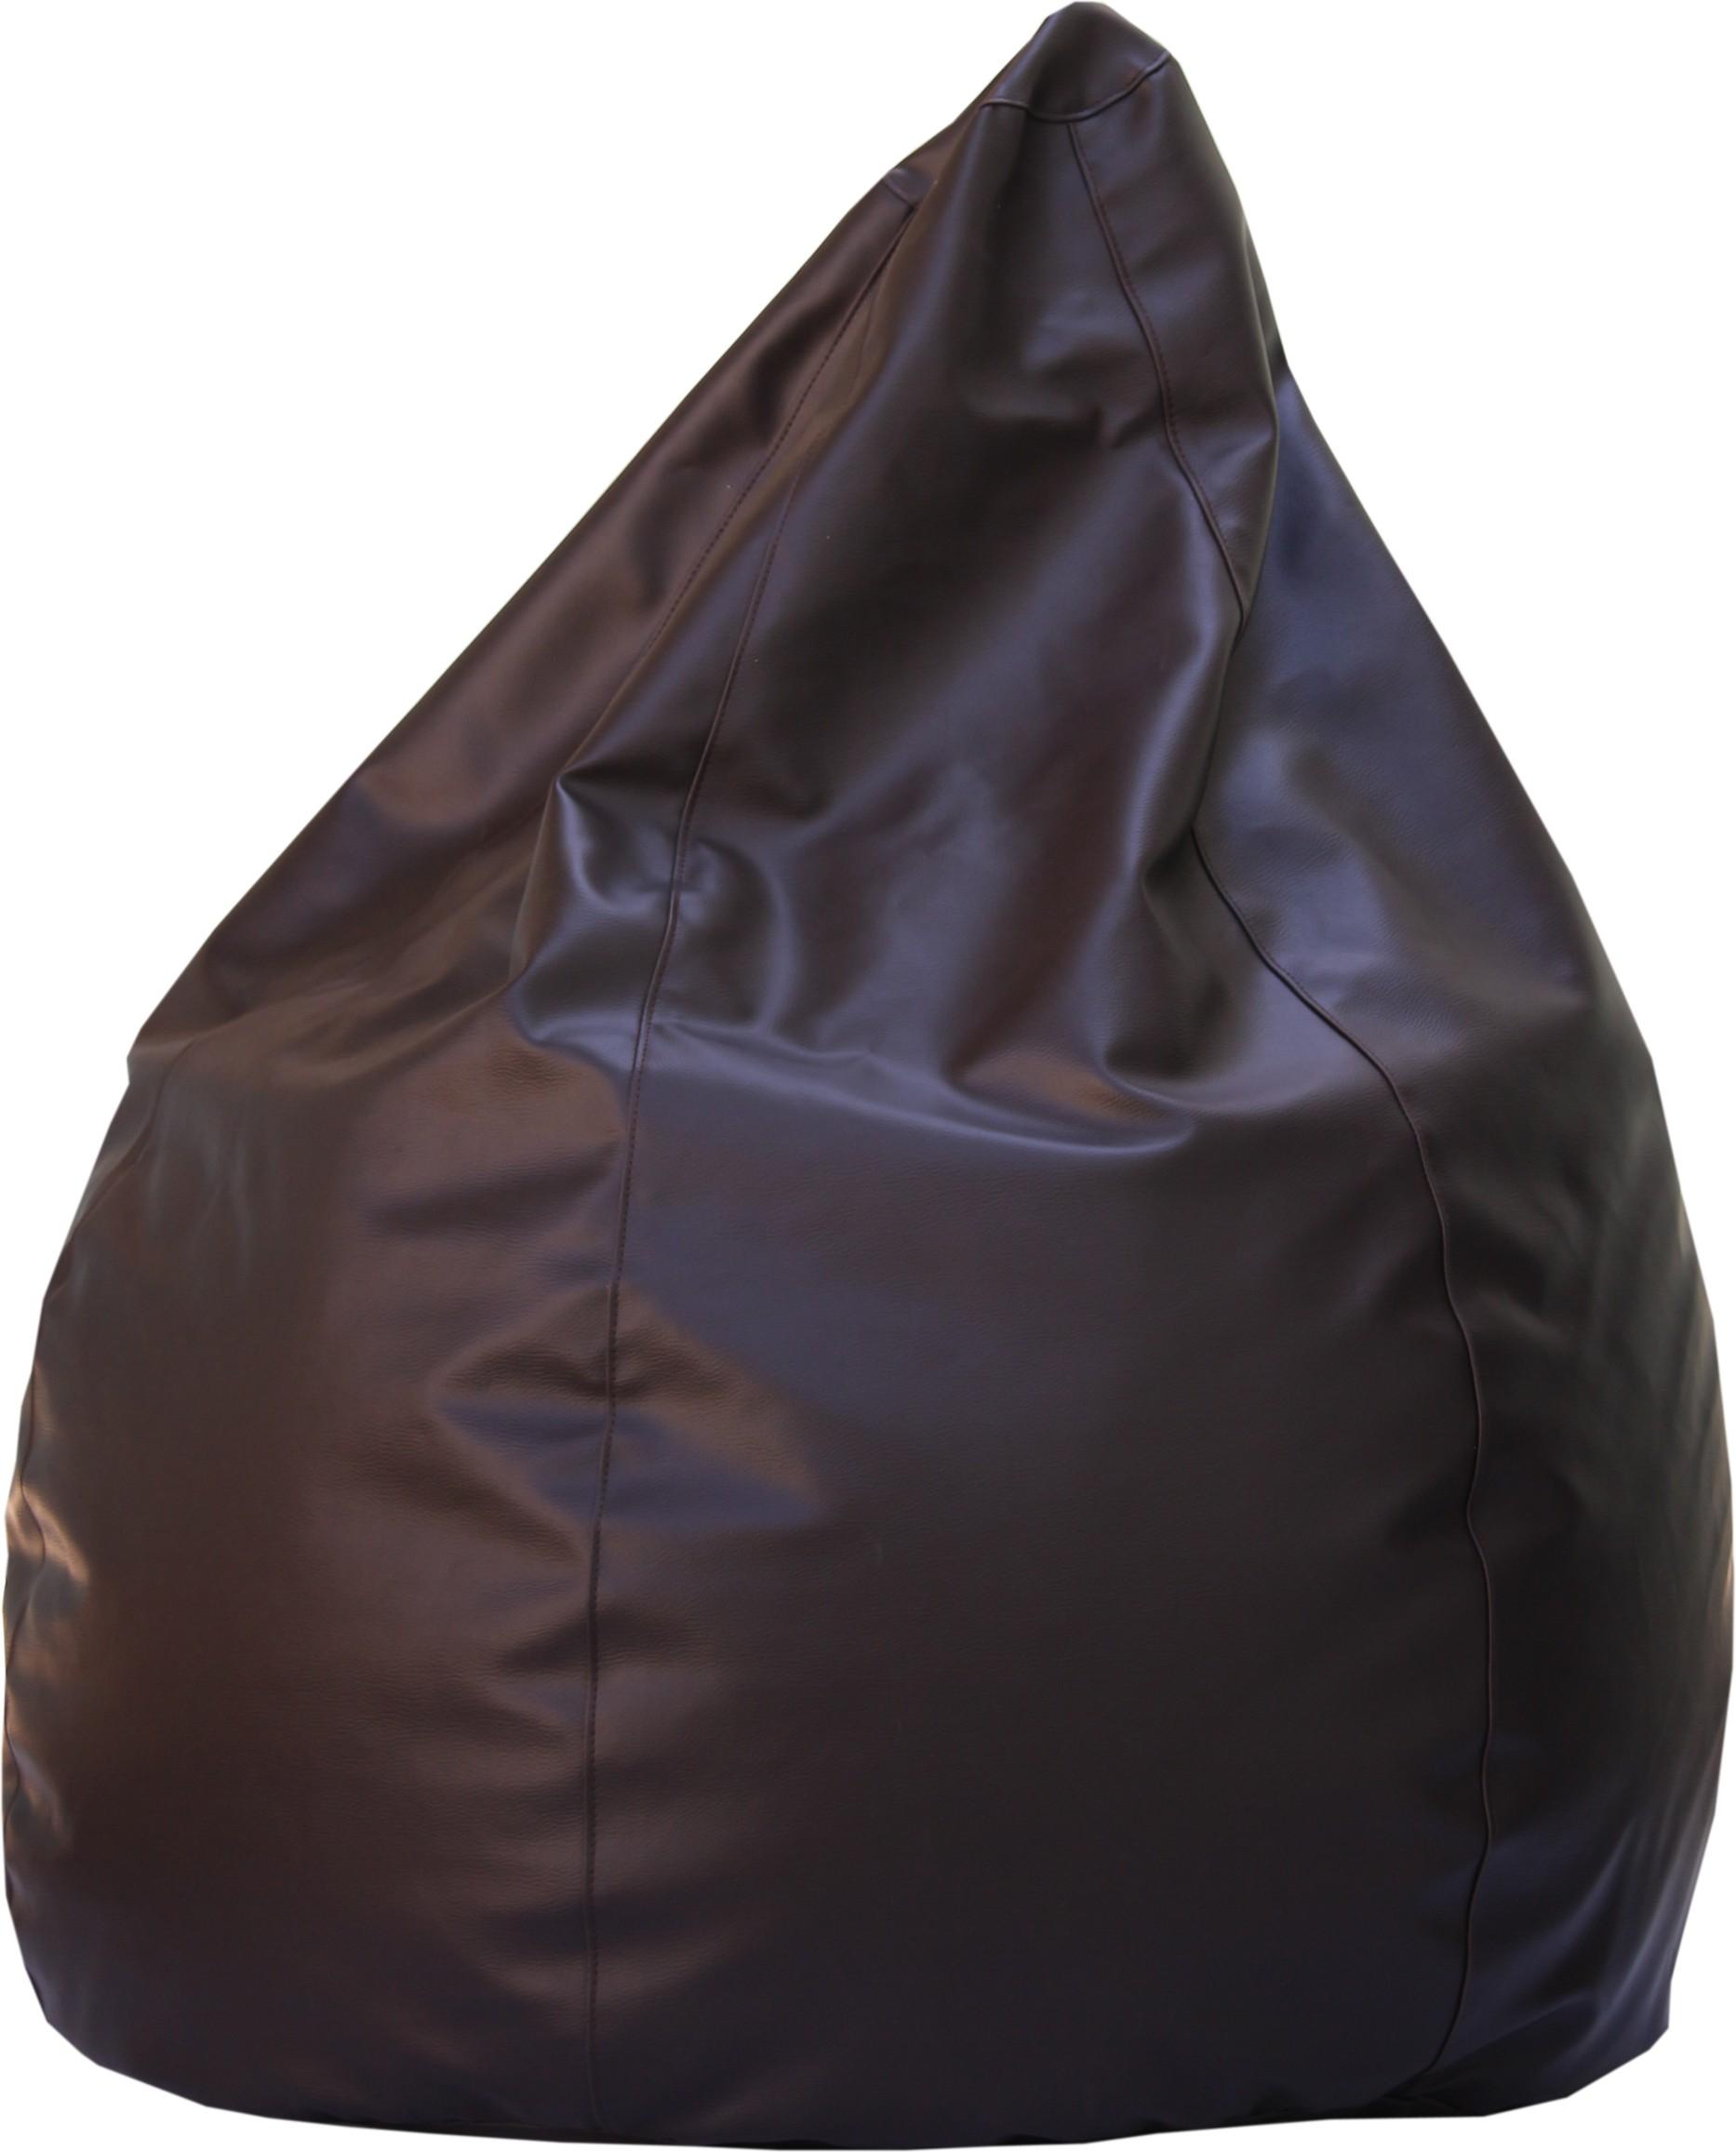 View Beanskart XXL Bean Bag  With Bean Filling(Brown) Furniture (Beanskart)